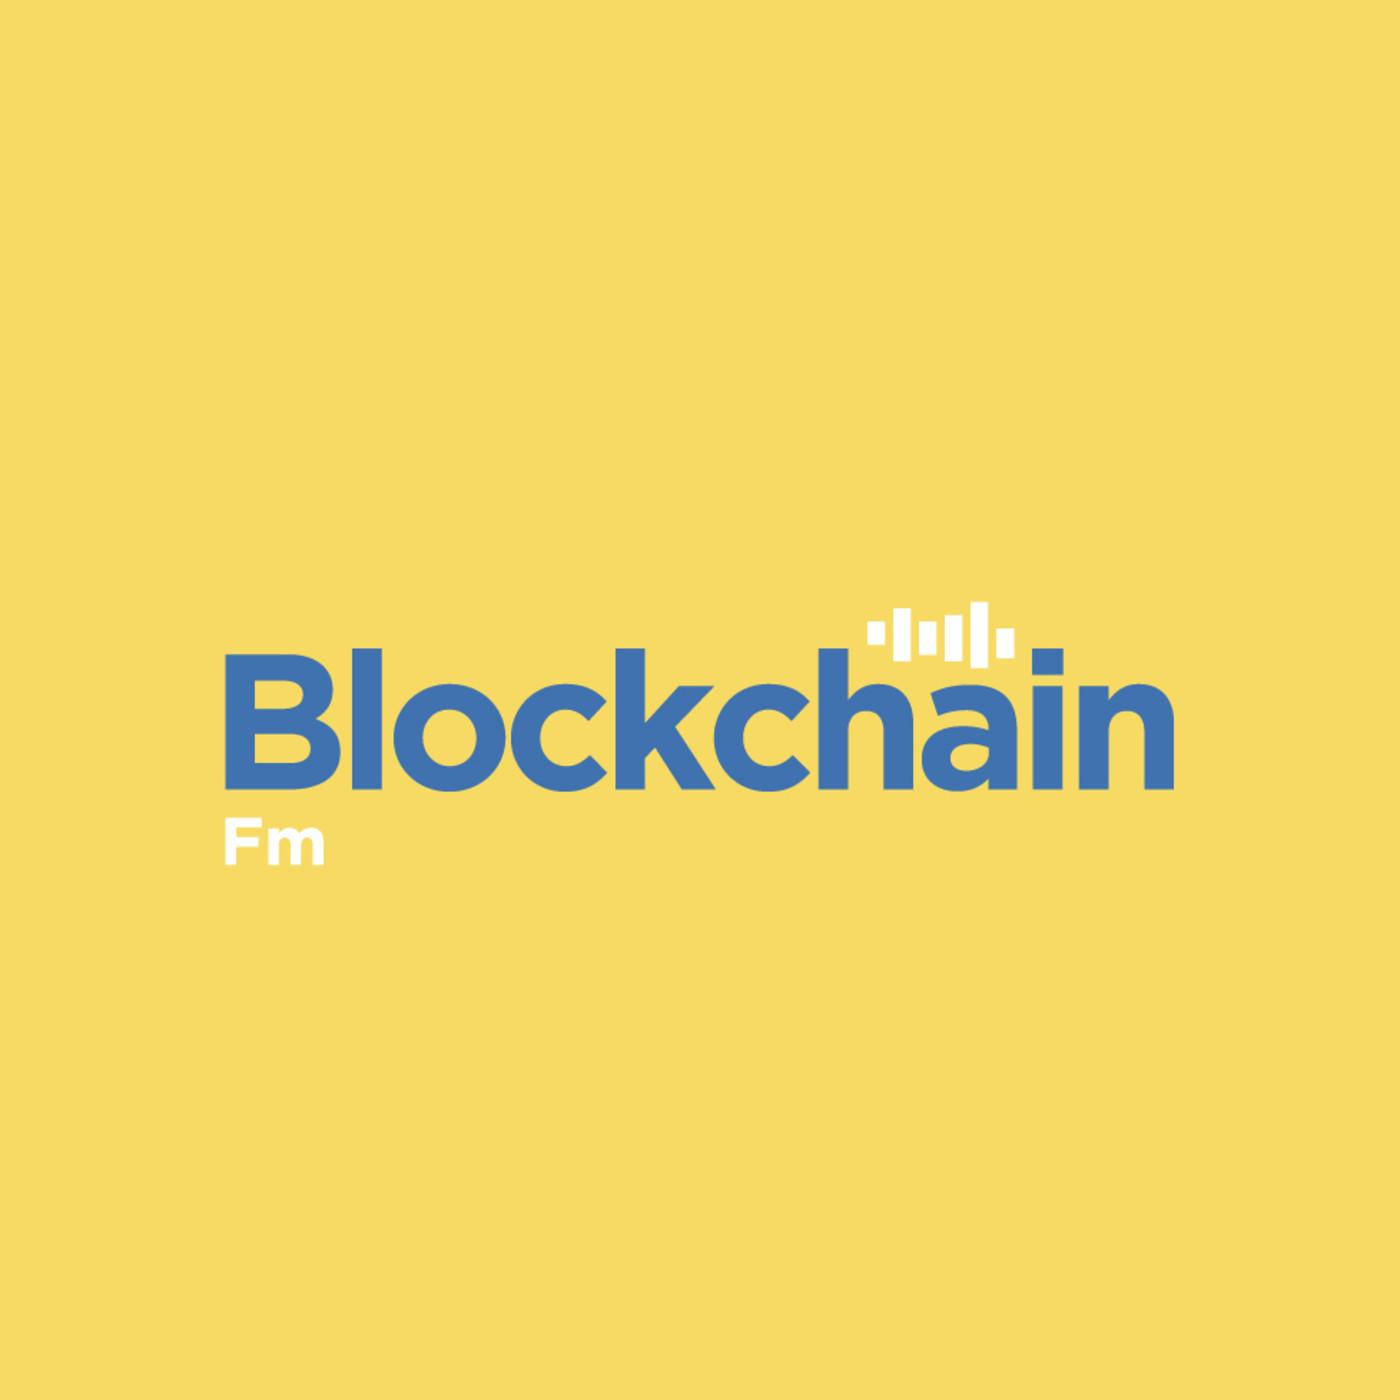 Mesa redonda Podcasters españoles - Cryptobirds, Territorio Bitcoin y Blockchain Fm